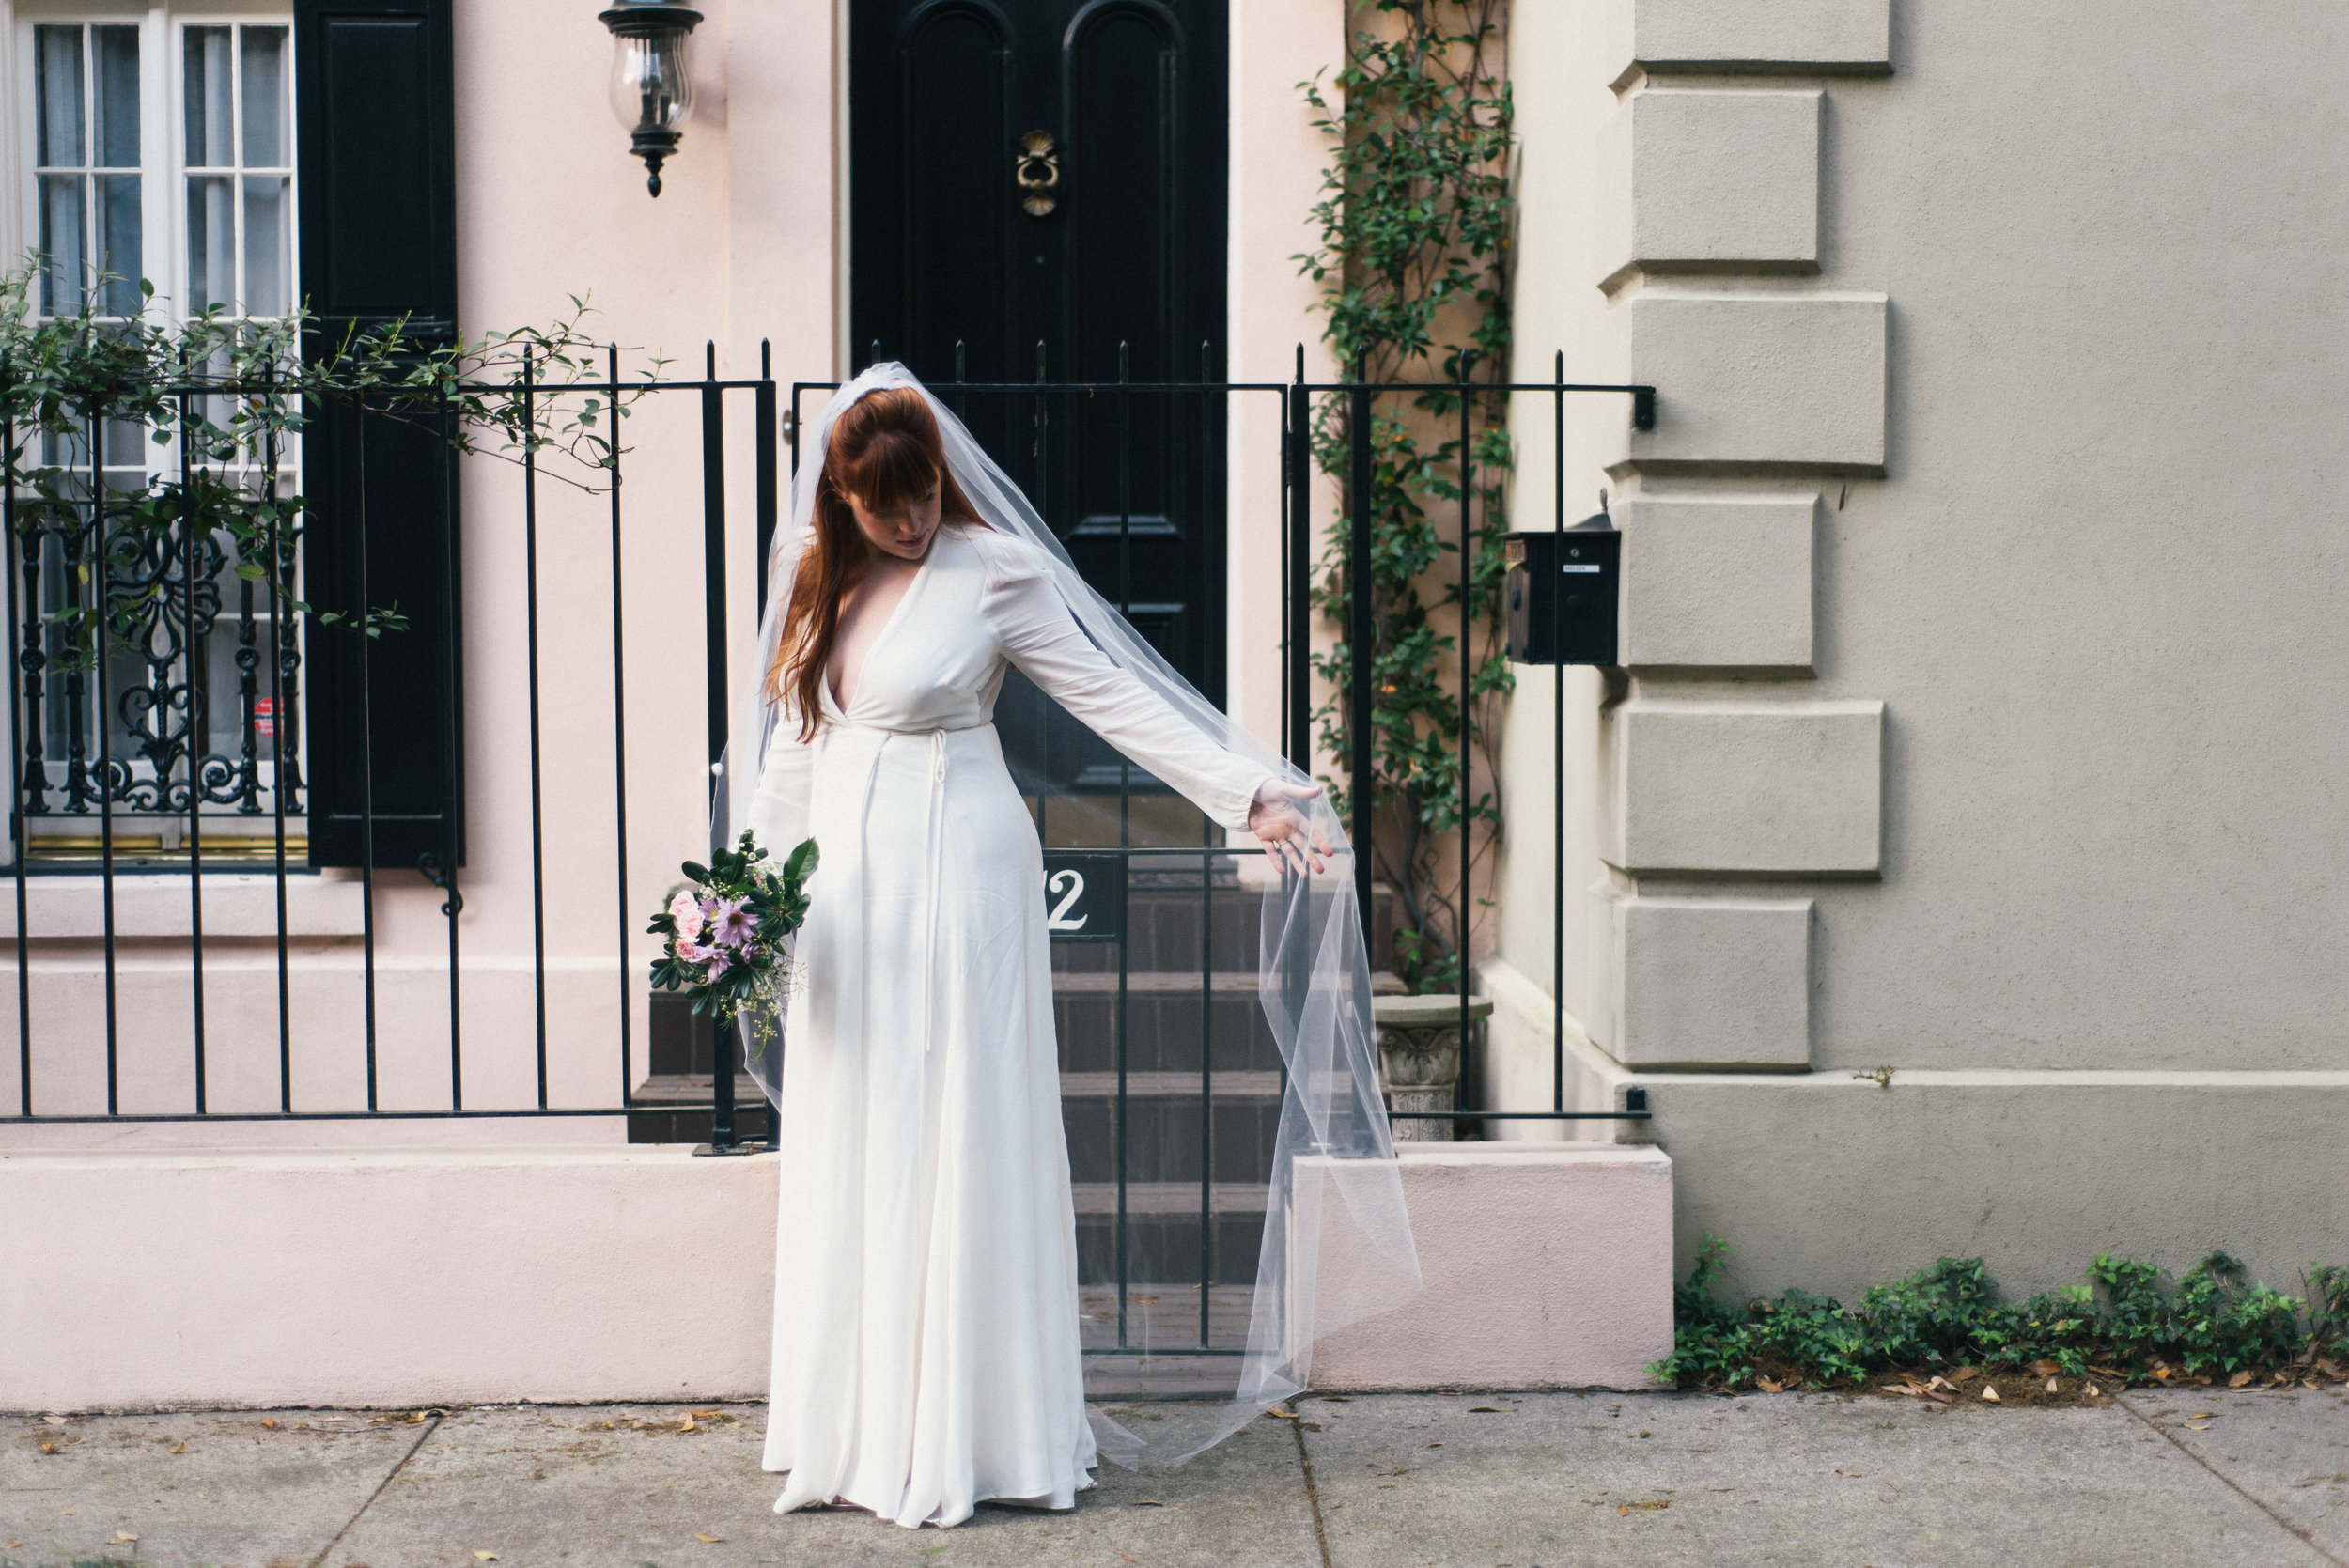 savannah-elopement-photography-savannah-georgia-elopement-photographer-savannah-wedding-photographer-meg-hill-photo-jade-hill- (46 of 58).jpg